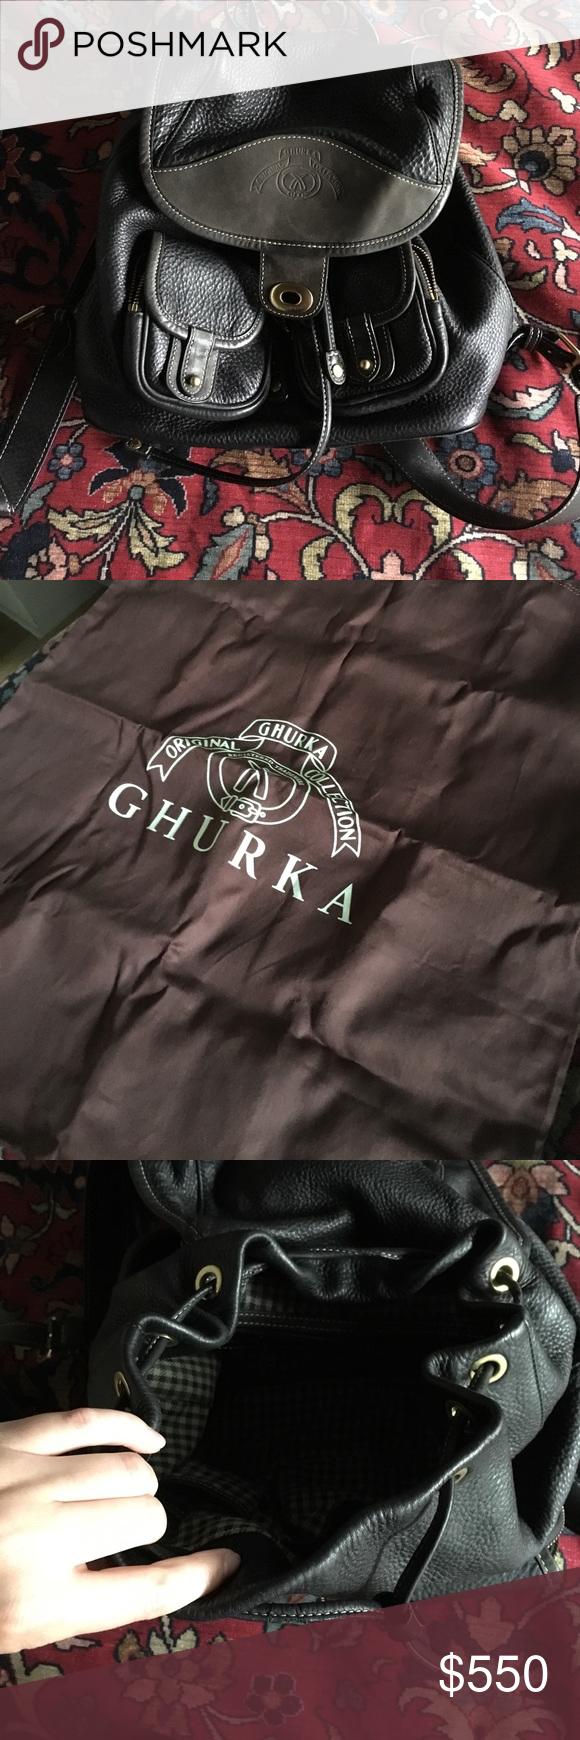 Authentic GHURKA leather backpack Gorgeous black leather ghurka backpack. Drawstring closure. Zip pocket on the inside. Comes with dust bag Ghurka Bags Backpacks